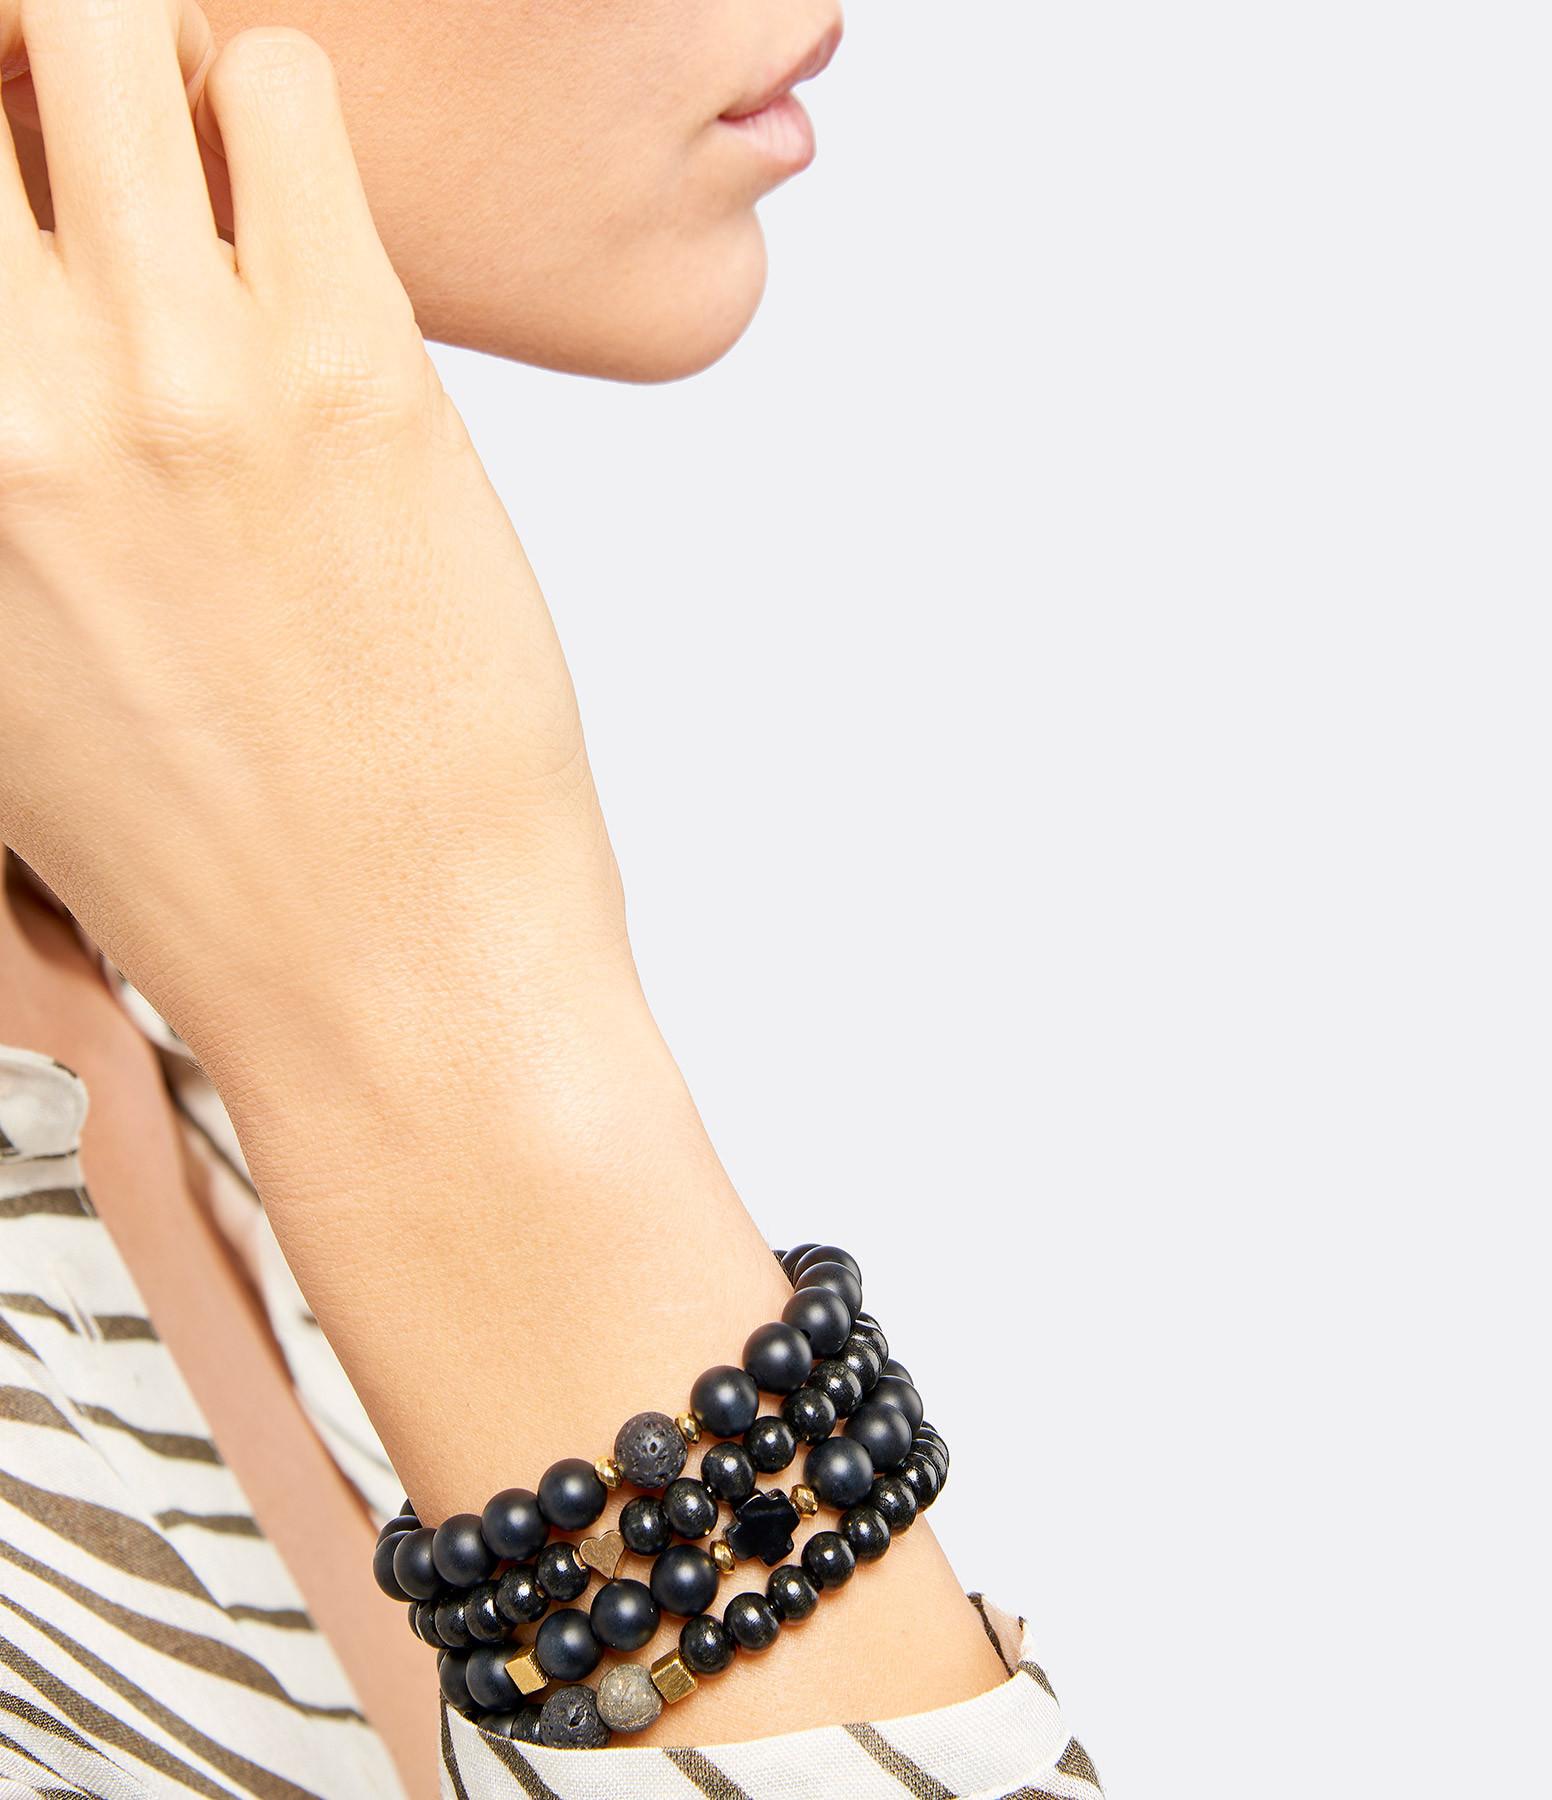 MI CIELO LONDON - Bracelet Bois Pierre de Lave Onyx